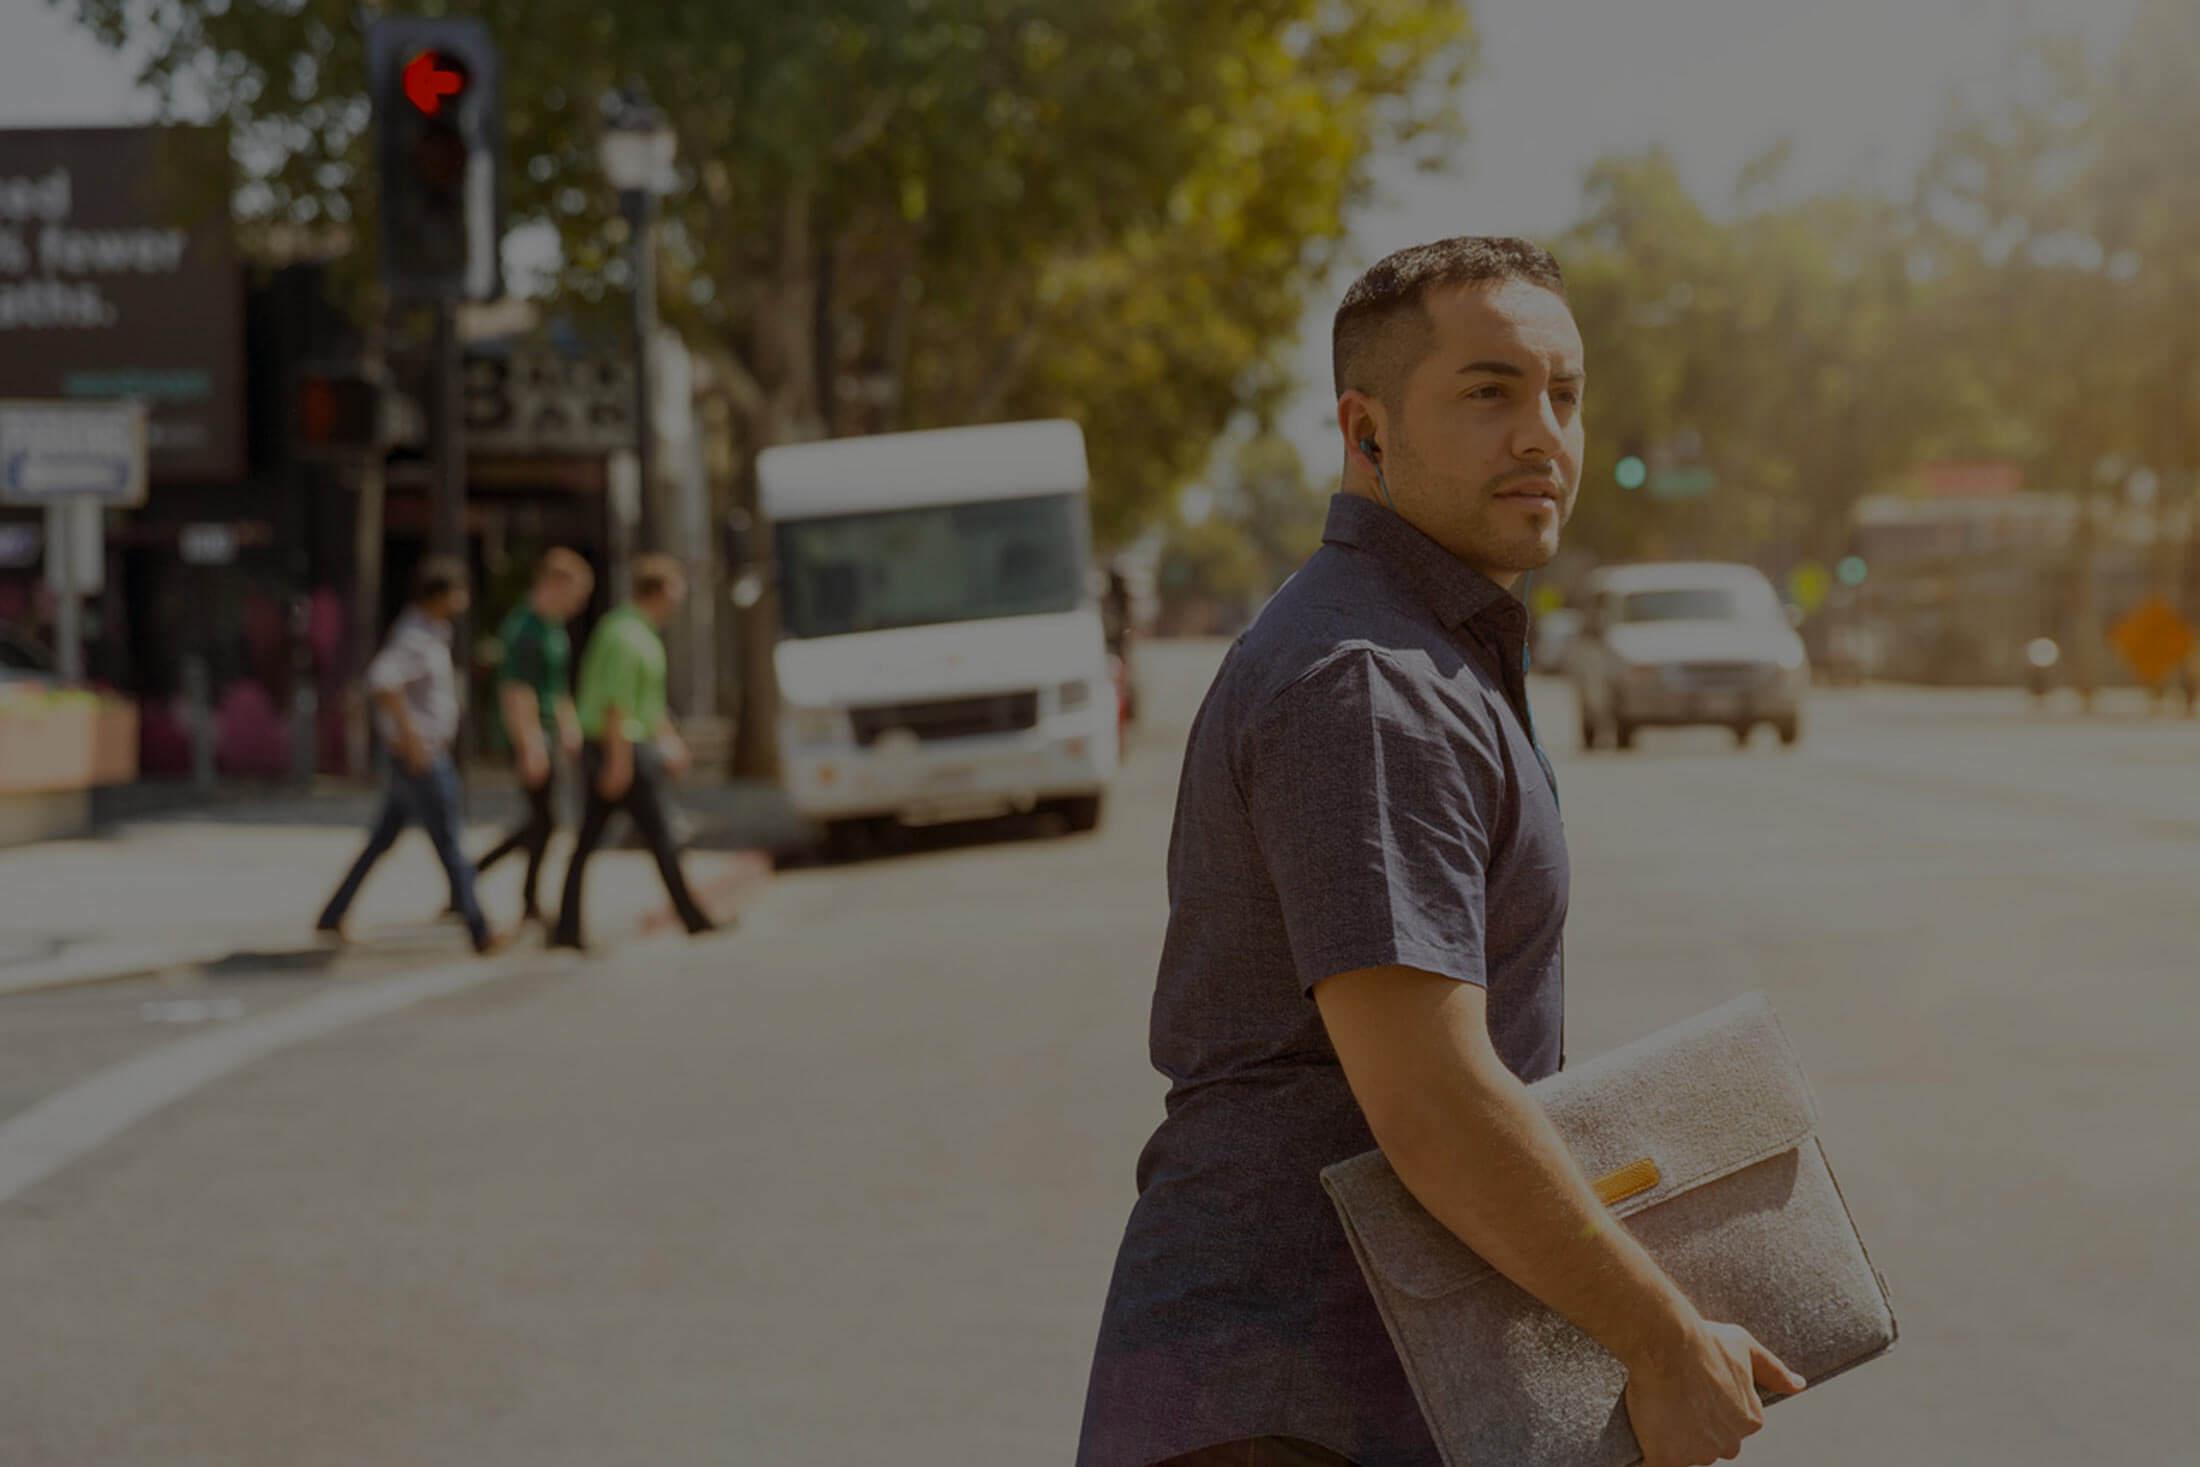 Pole emploi - offre emploi Cariste 3 (H/F) - Le Pontet